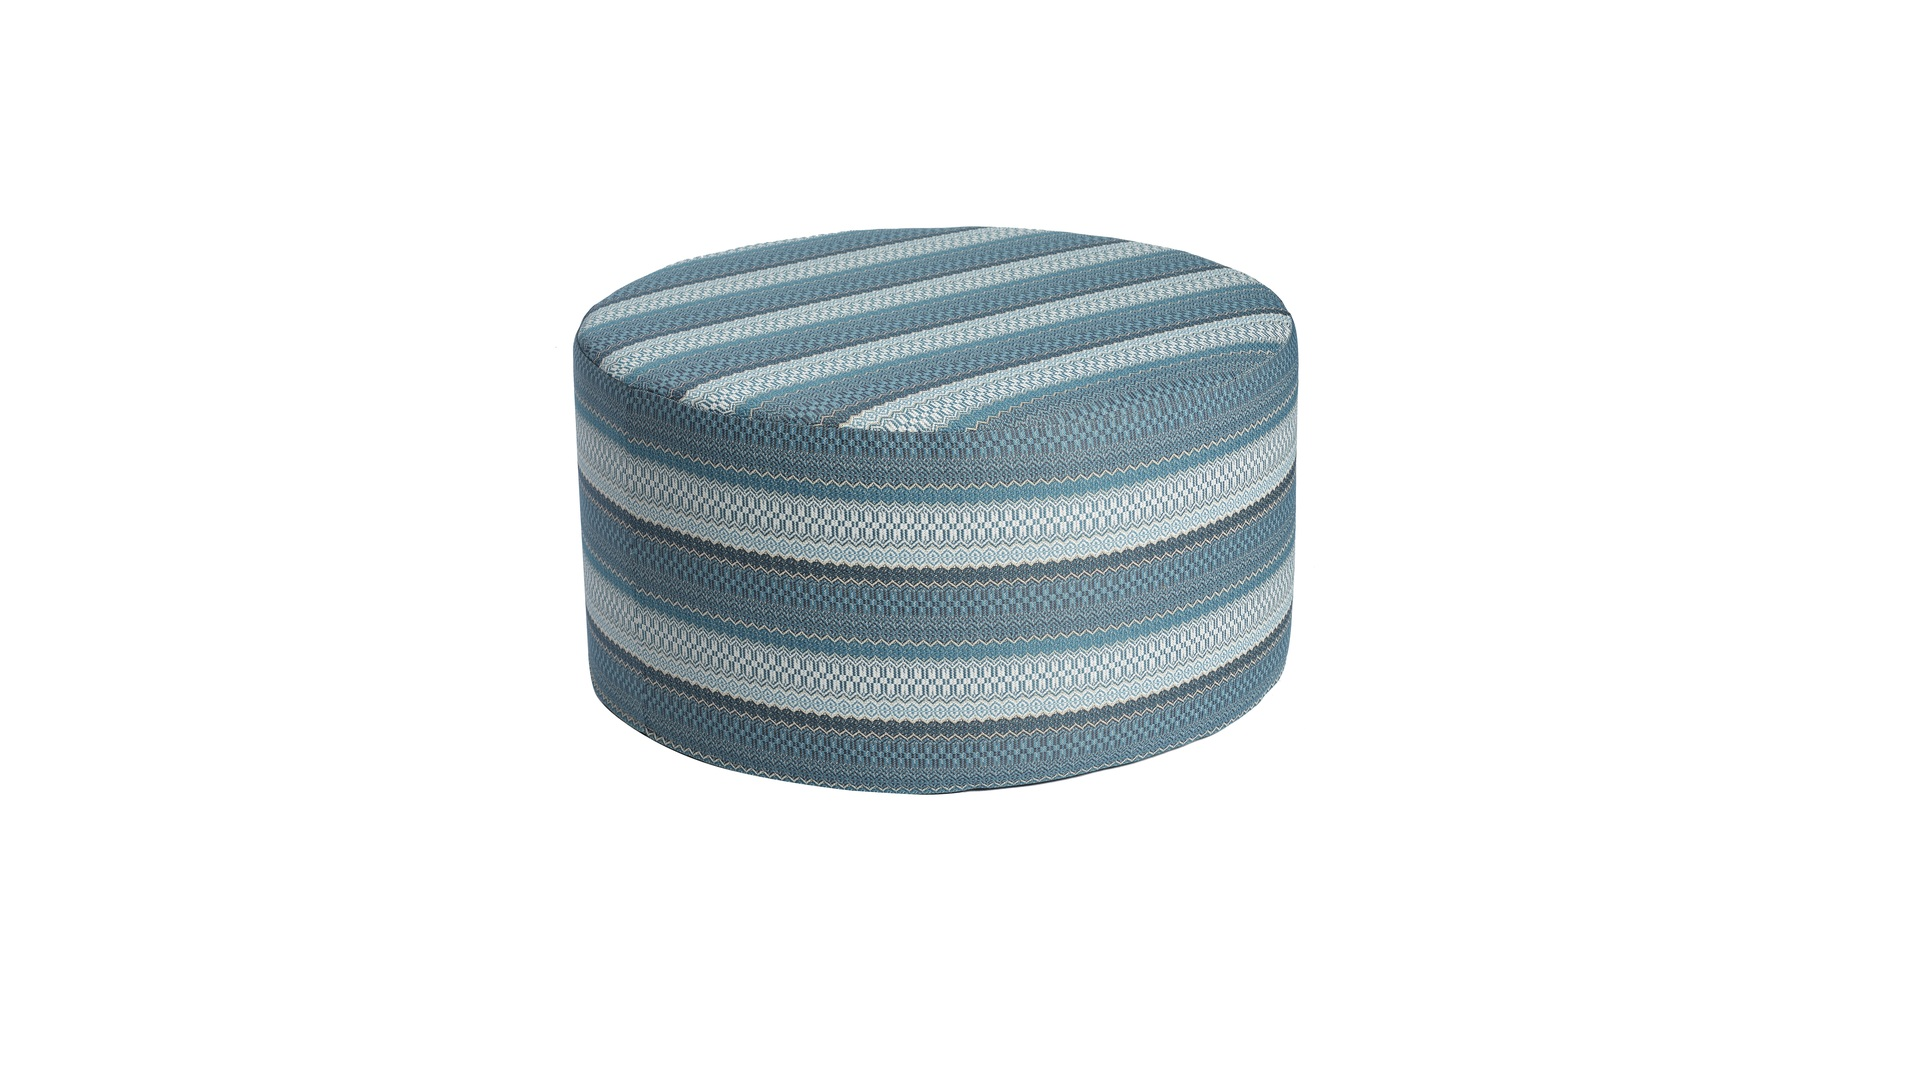 2020 Borek outdoor fabric Desio pouffe Ø80 azzuro 5541 3.jpg